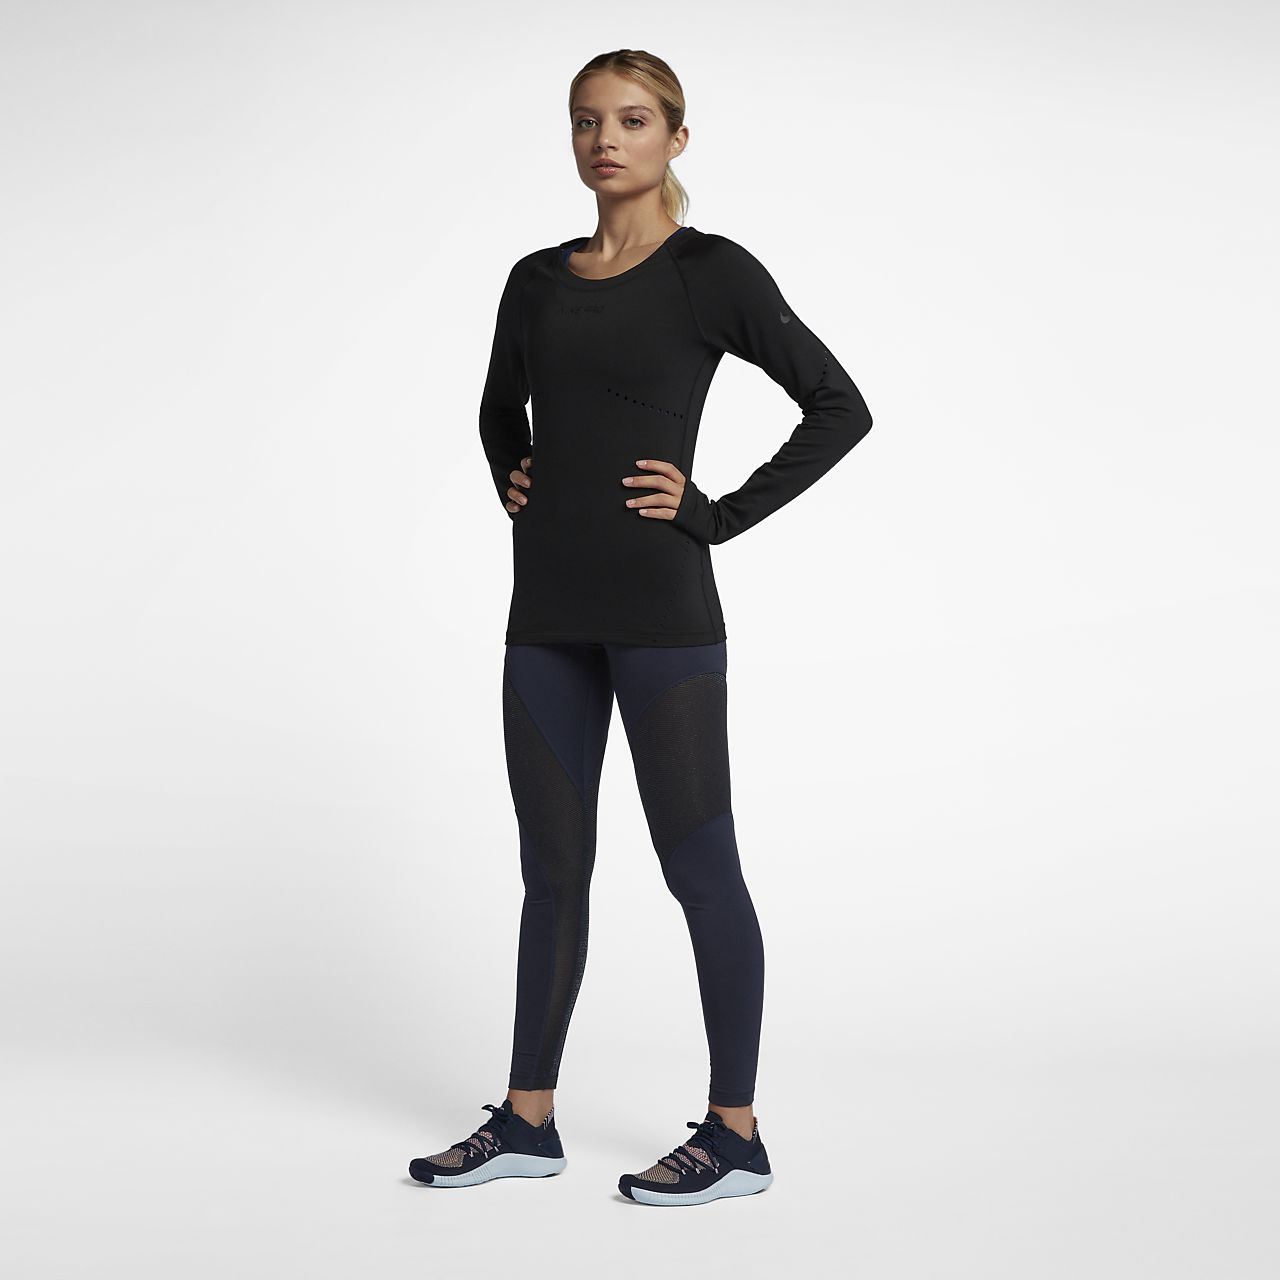 160a0630b7e7f Nike Pro Warm Women s Sparkle 7 8 Tights. Nike.com